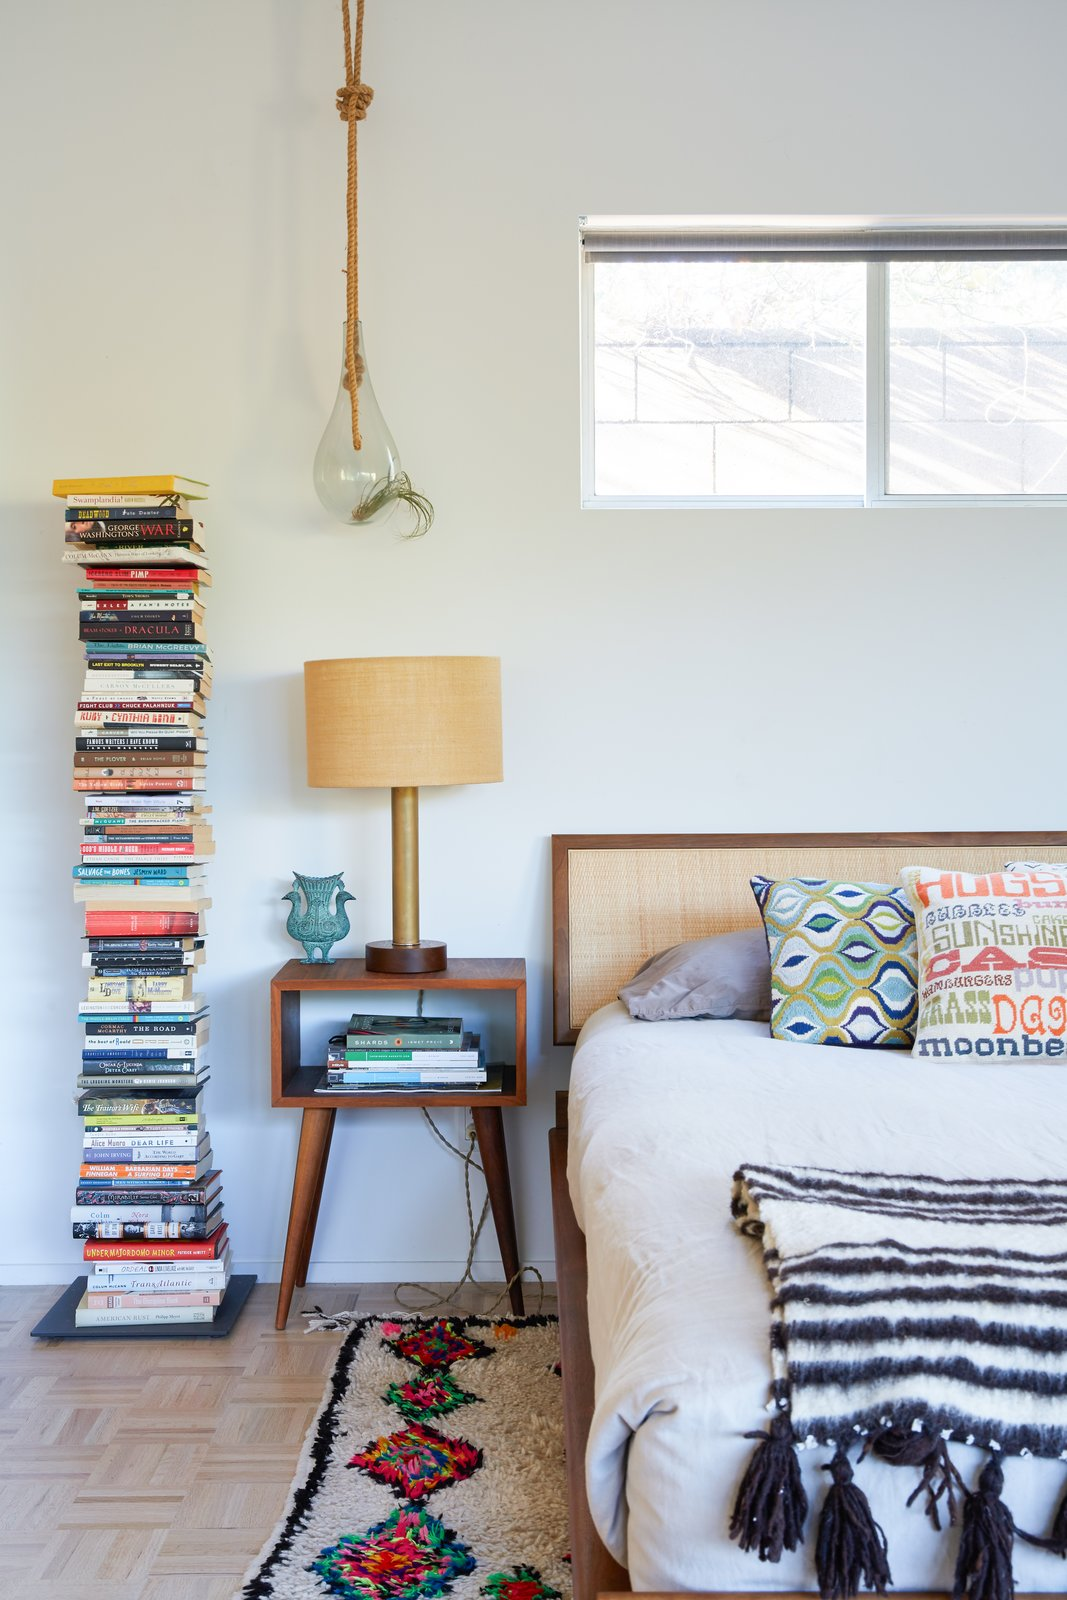 Bedroom, Bed, Night Stands, Table Lighting, Light Hardwood Floor, and Rug Floor Detail of Guest Bedroom  Midcentury Dream House